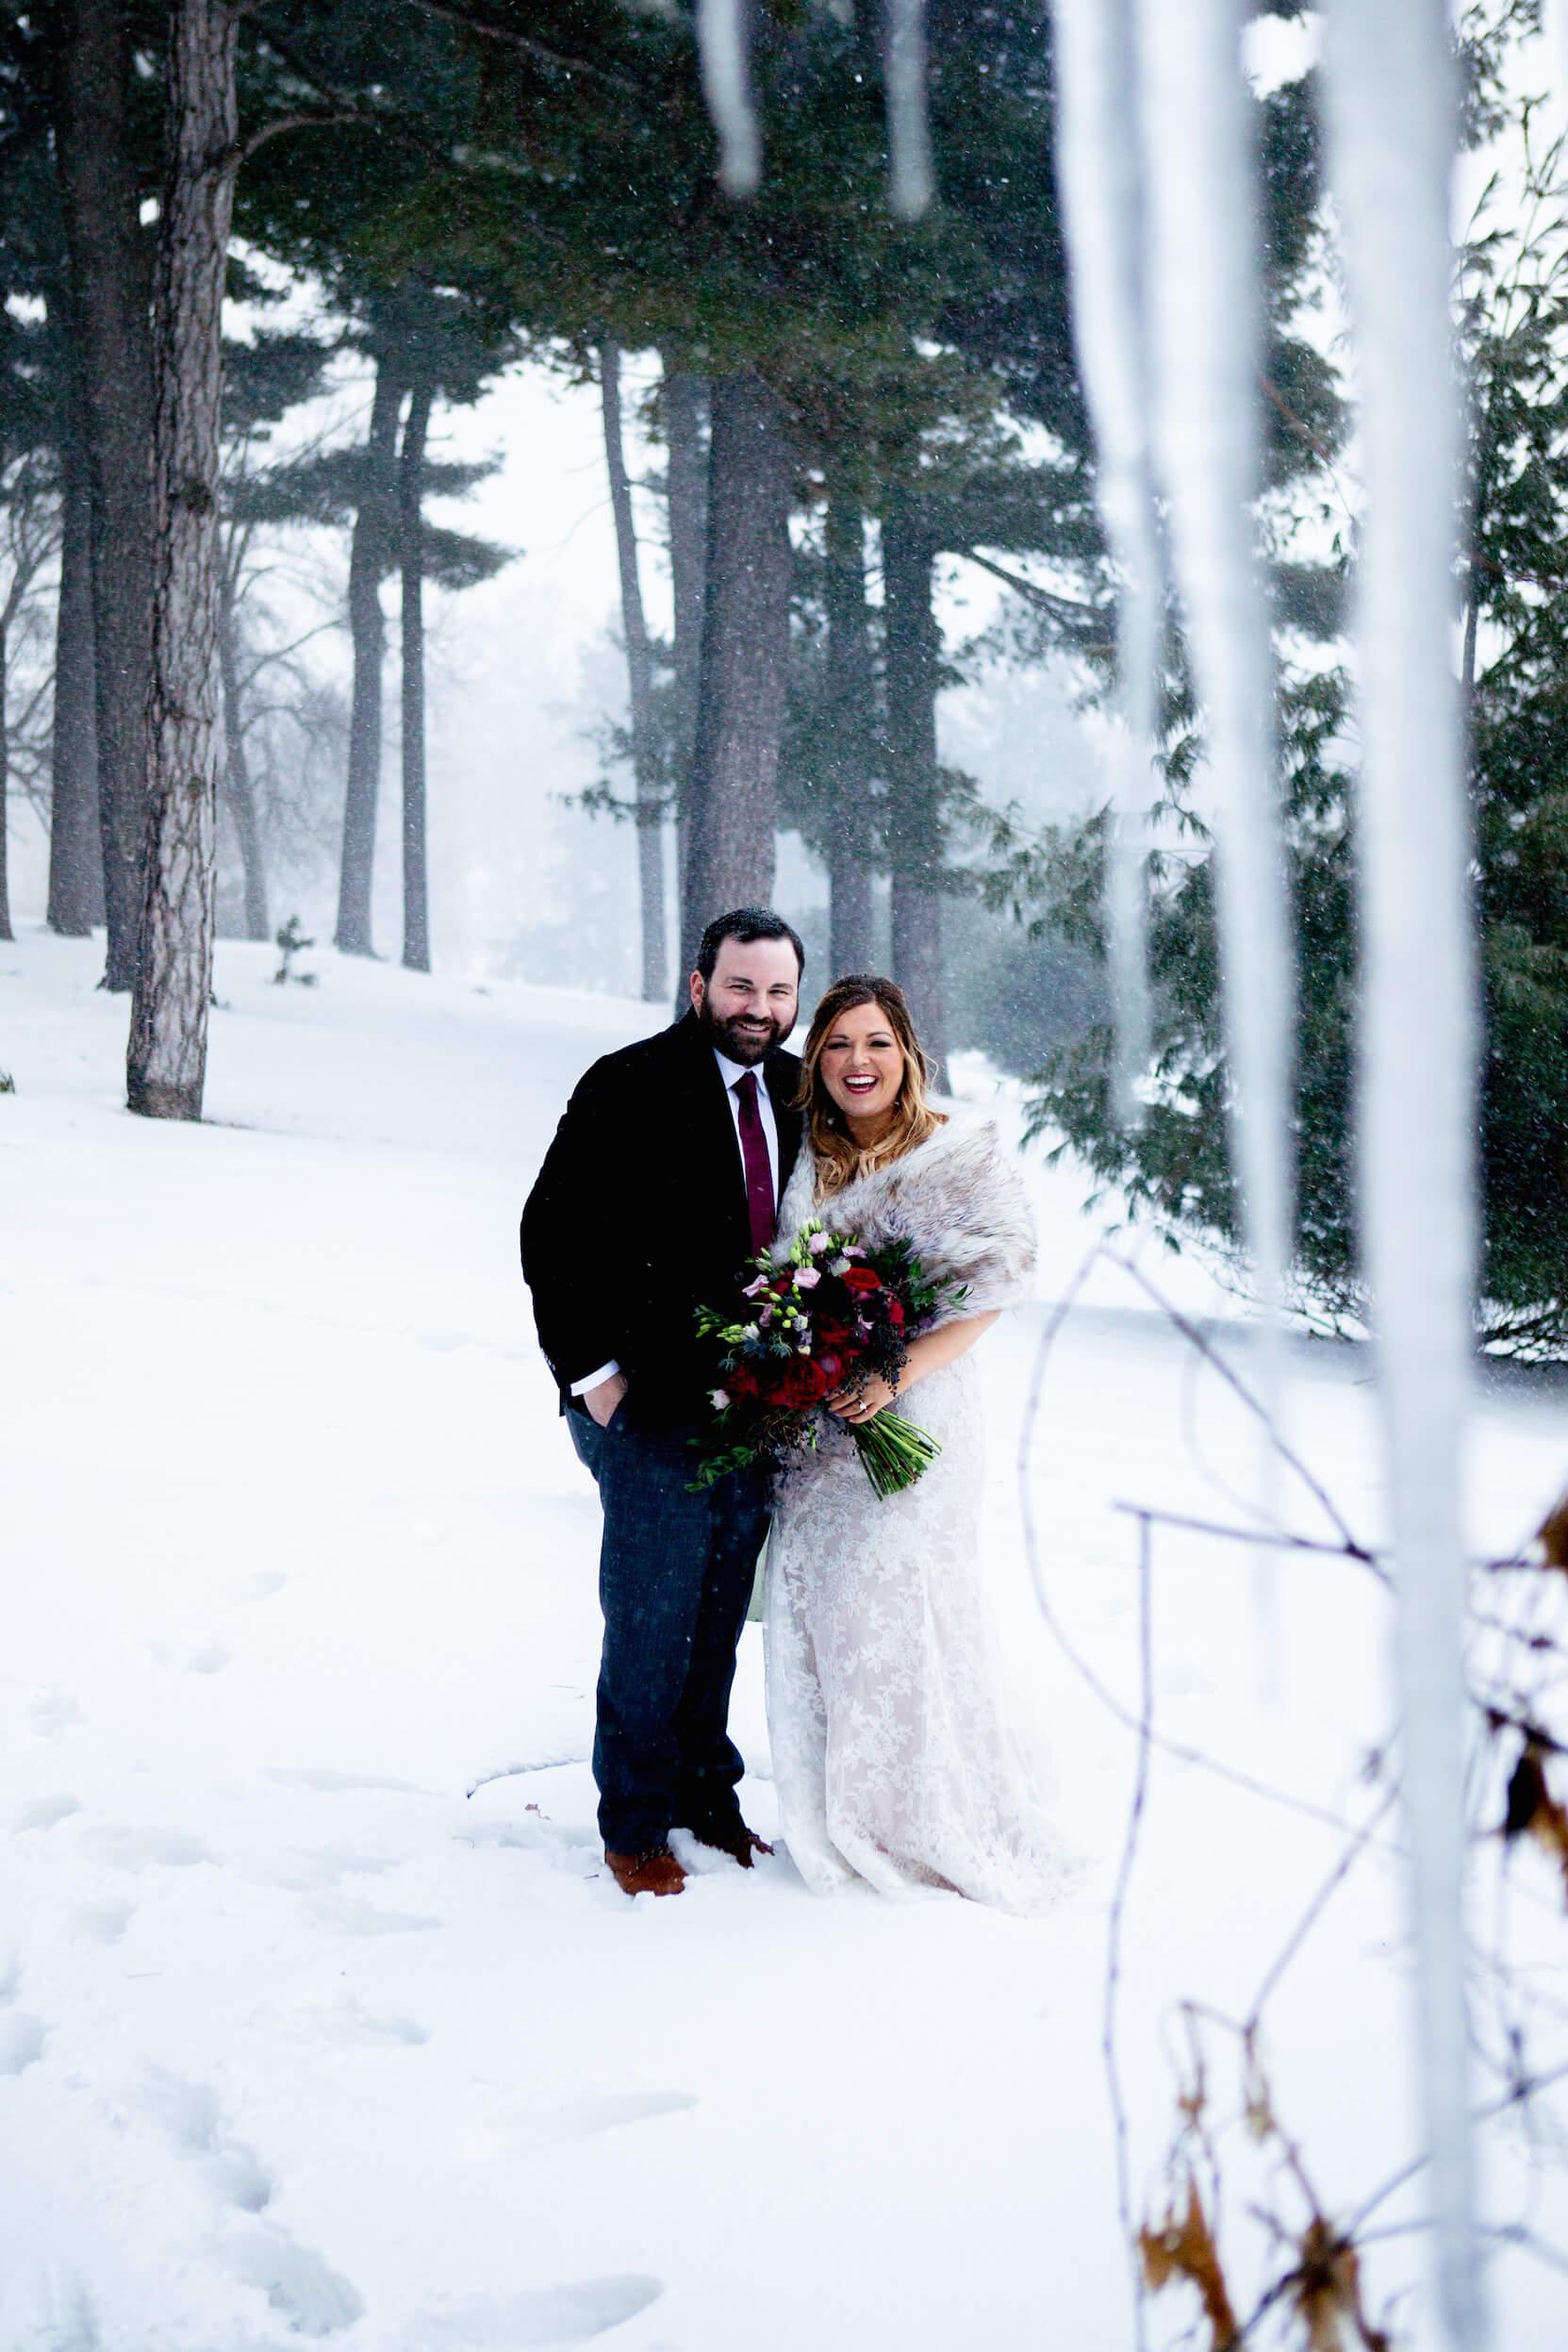 Winter Blizzard Wedding, Omaha, Nebraska.  Elmwood Park.  Invitations designed by Dana Osborne Design.